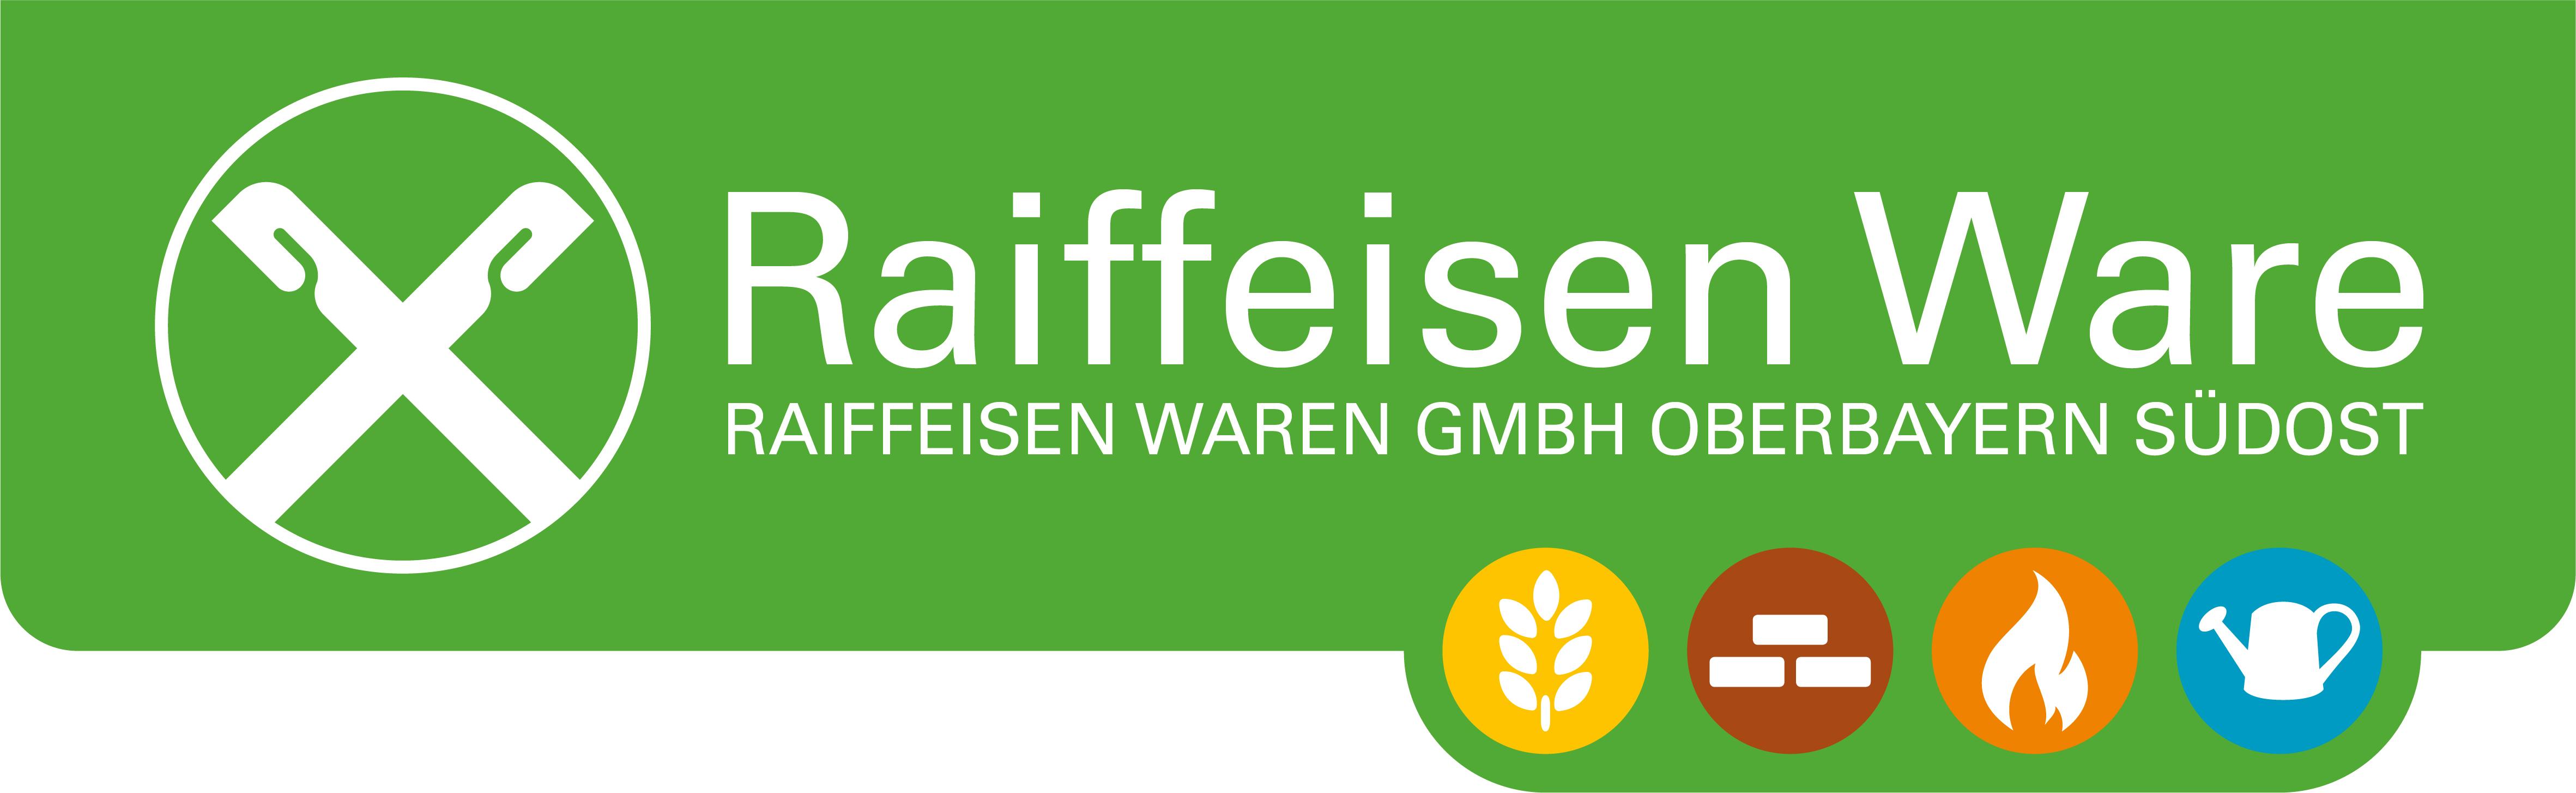 Raiffeisen Waren GmbH Oberbayern Südost - Lagerhaus Asten Tittmoning